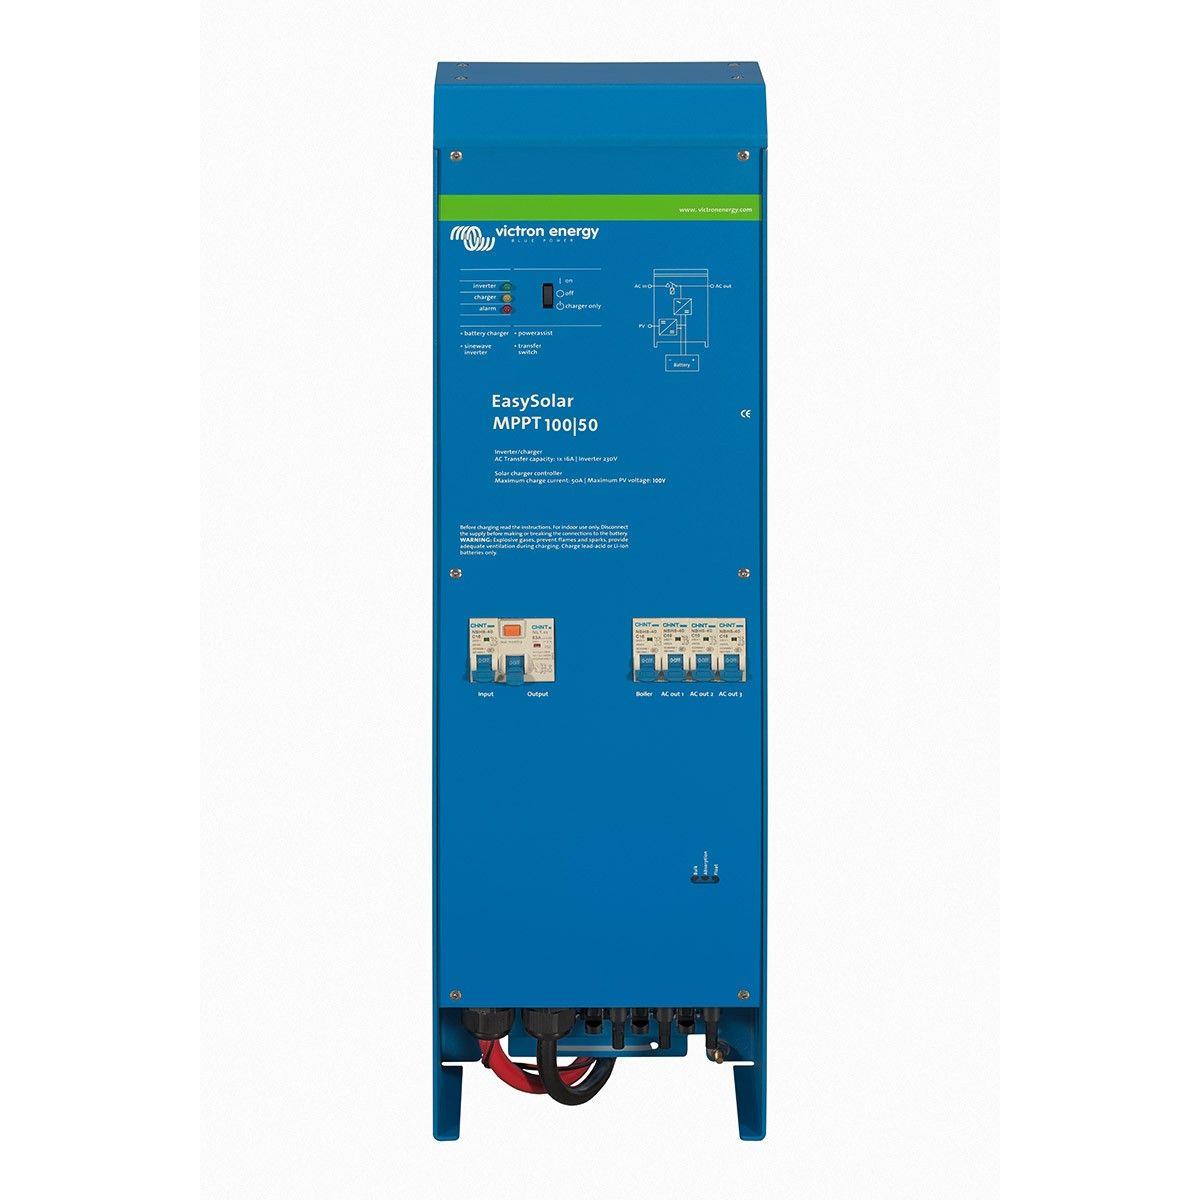 EasySolar 12 1600 70-16 MPPT 100 50 Victron Energy